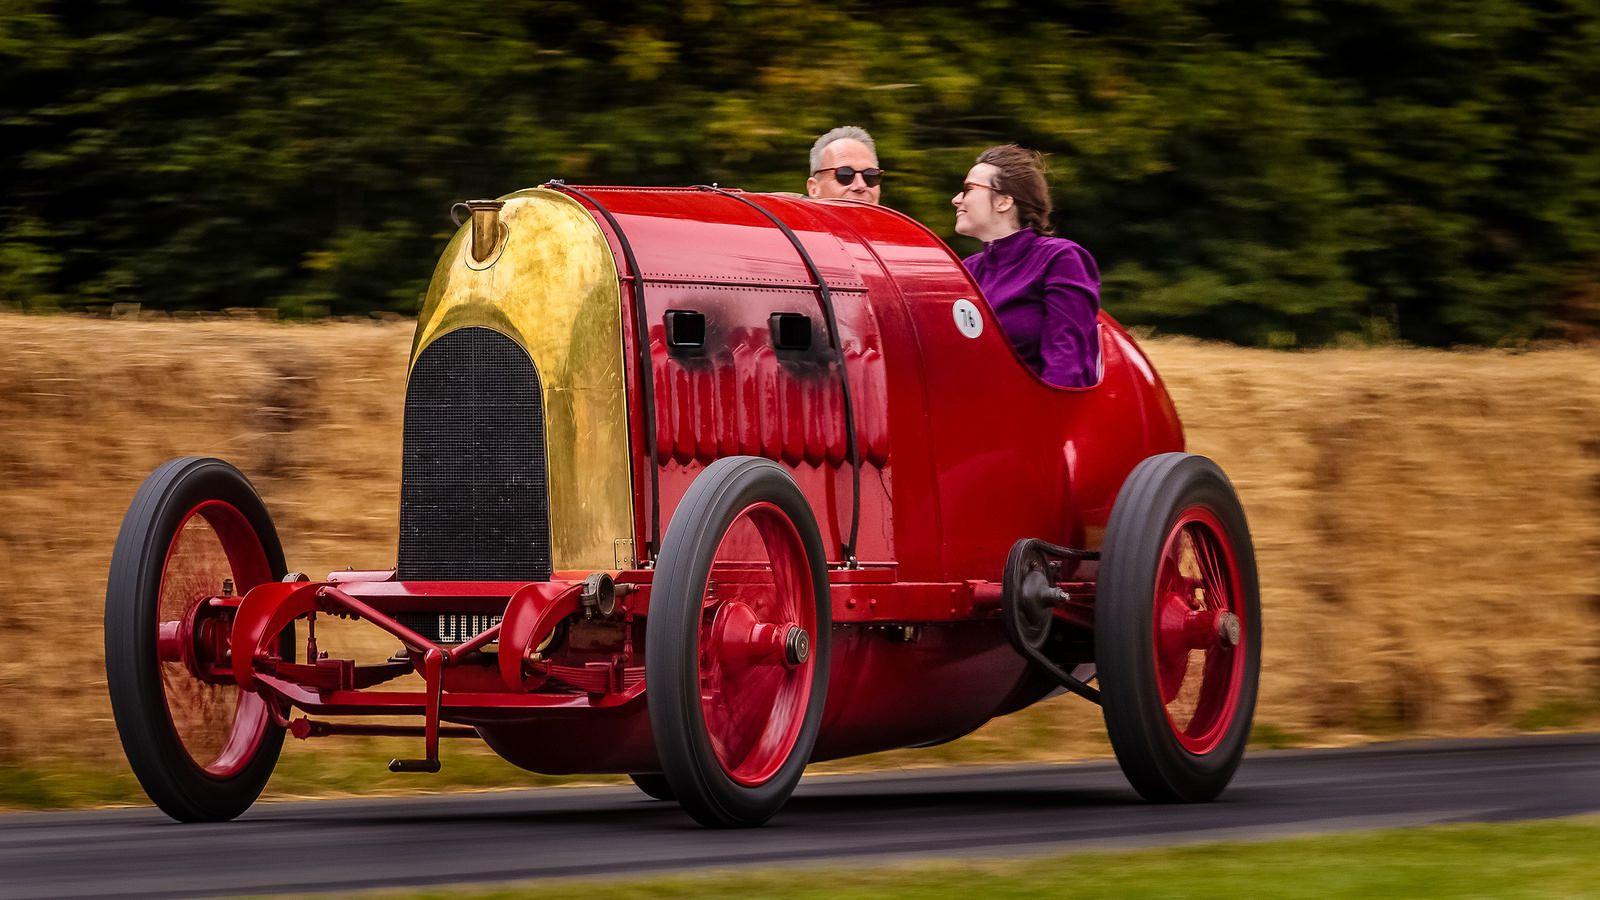 Fiat S76 1911 28 4 Litre Engine 4 Cylinder Fiat Goodwood Festival Of Speed Goodwood Festival